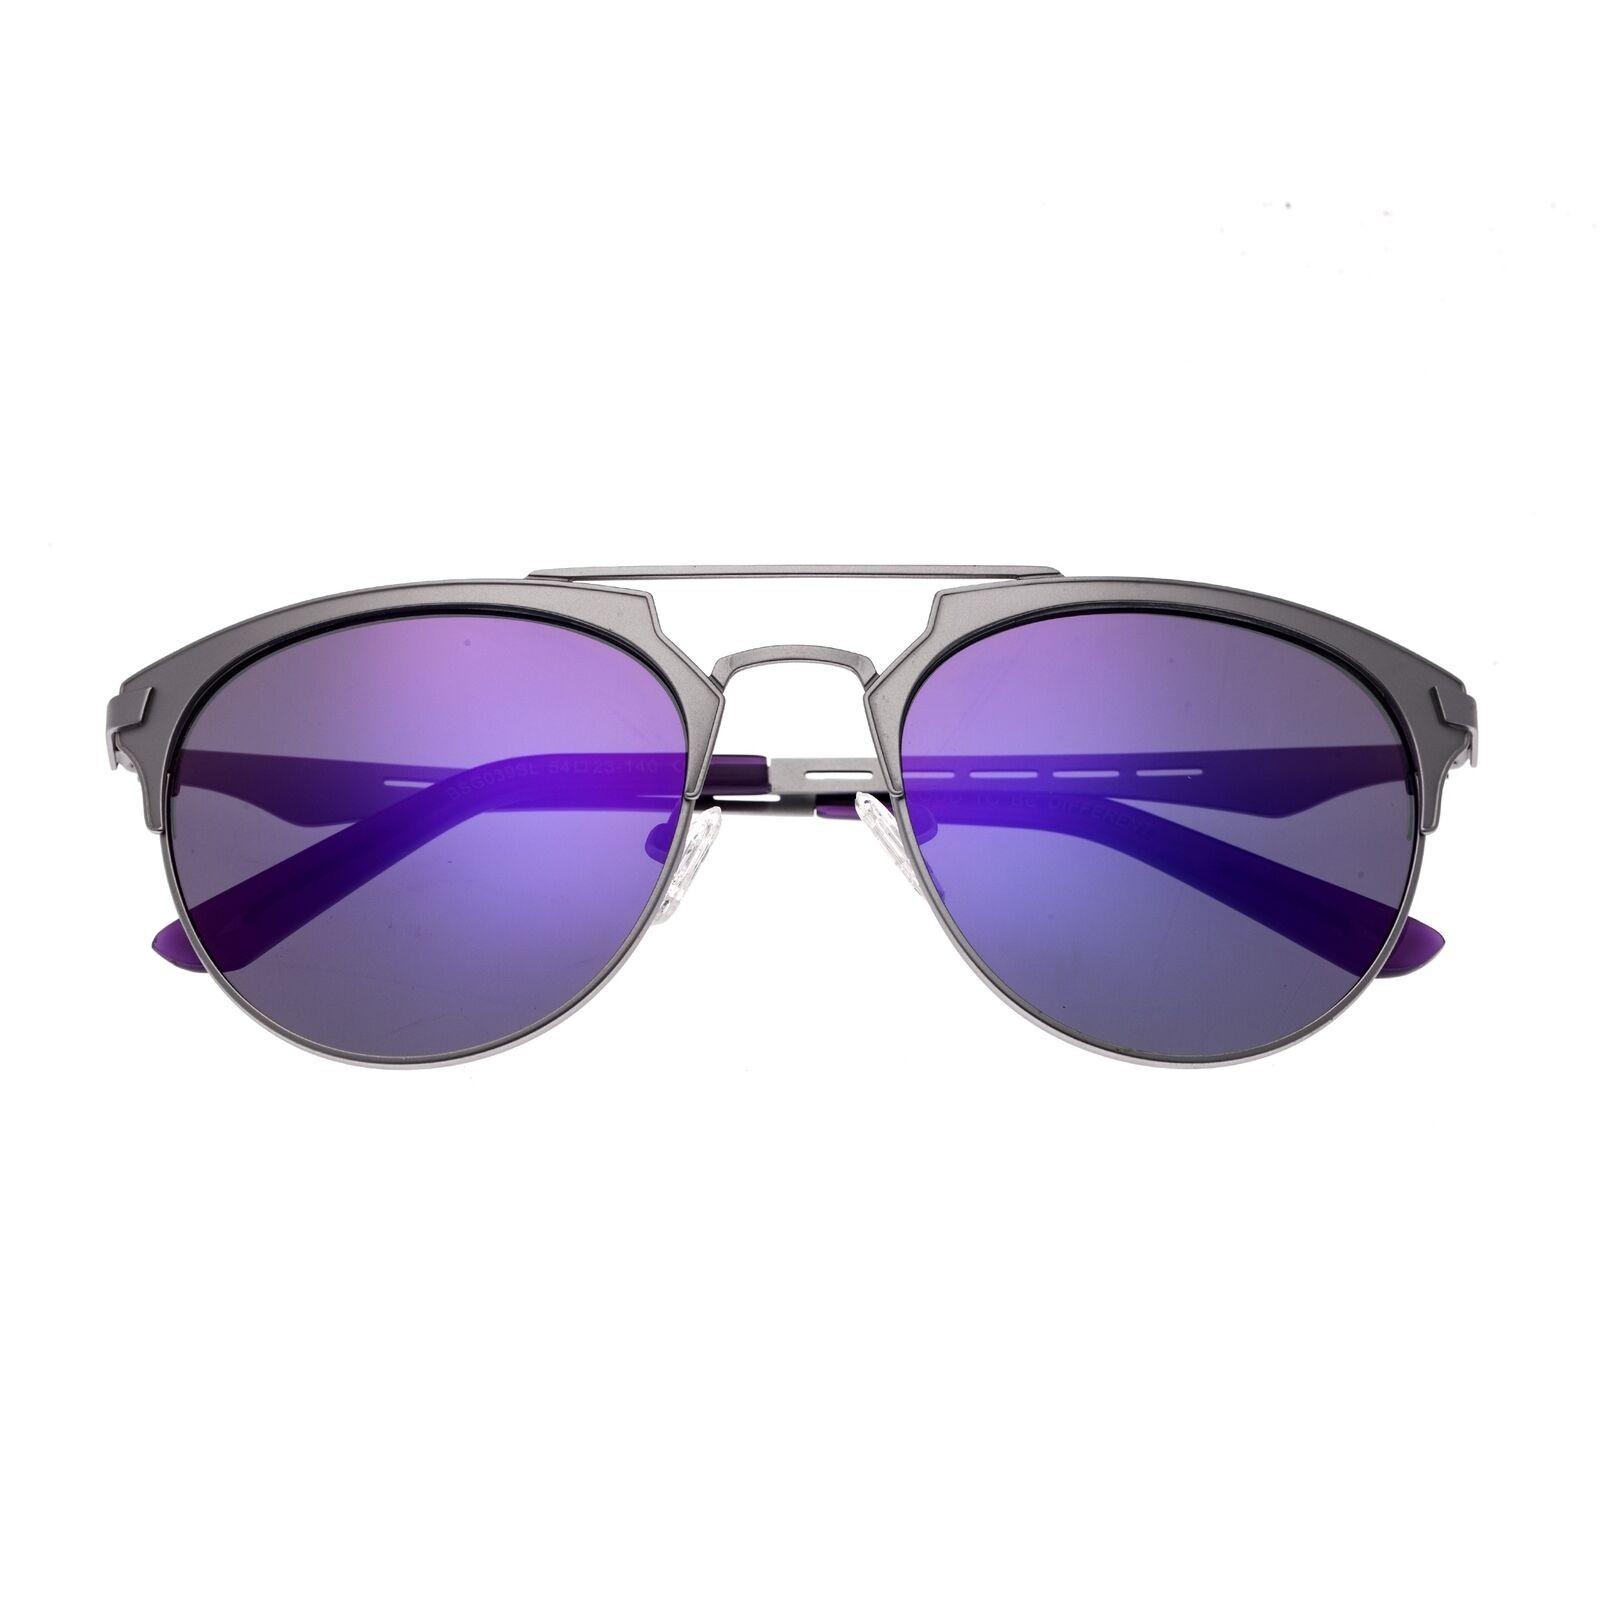 936bcaa0a184 Details about Breed Hercules Silver Titanium Polarized Purple Lens Men's  Sunglasses 039SL